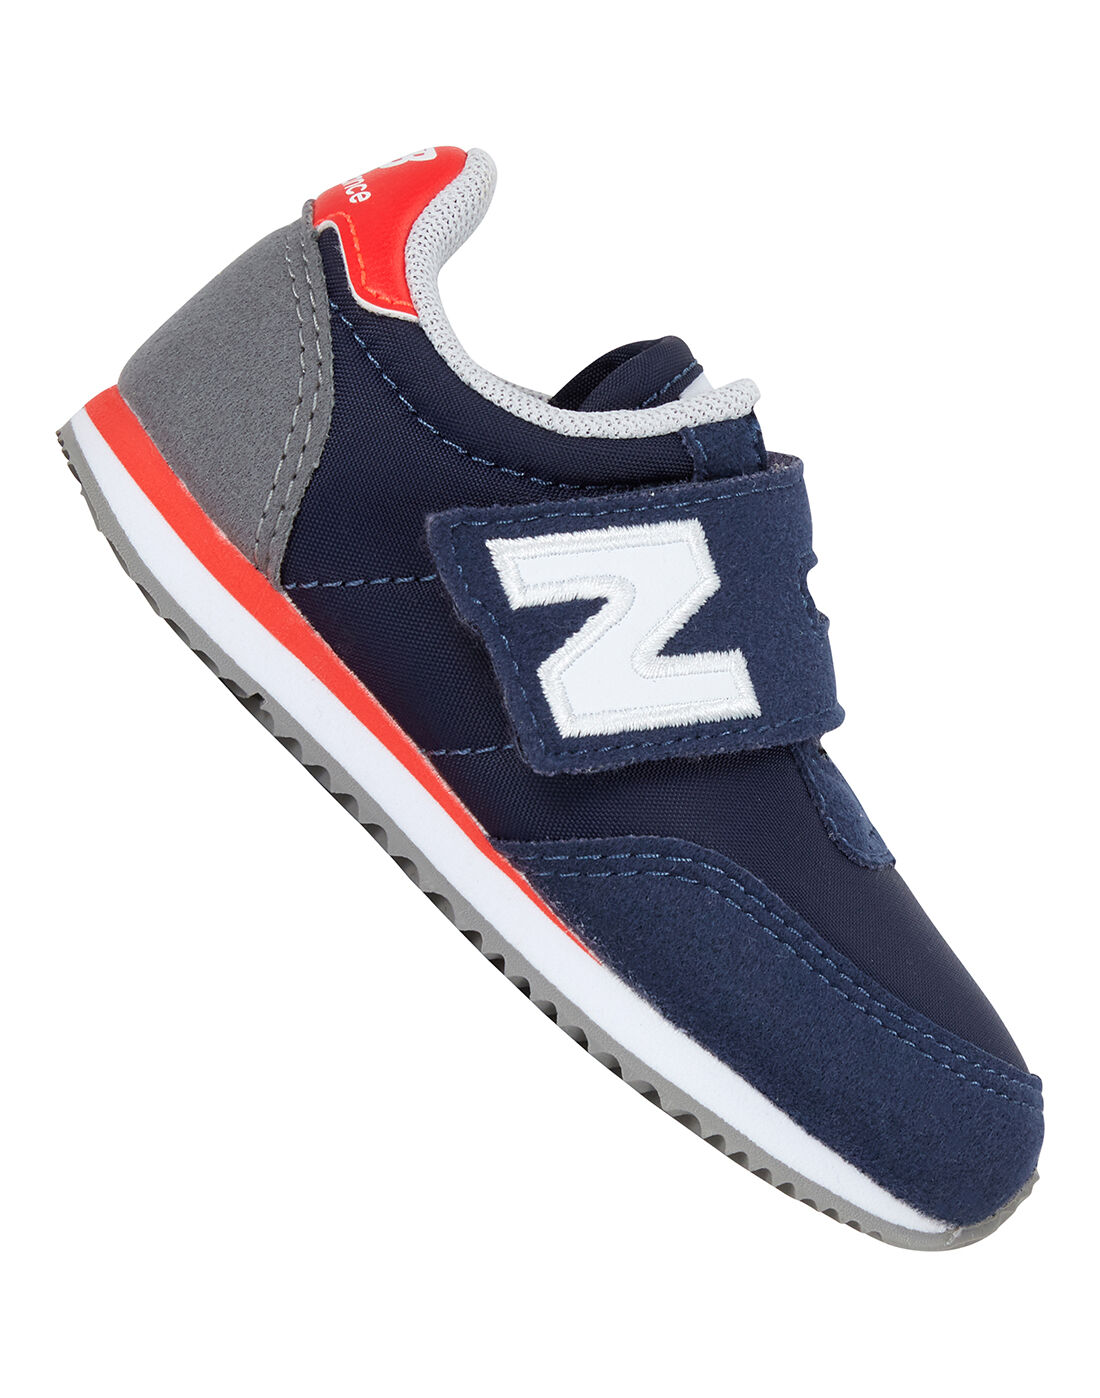 Balance Infant Boys 720 Trainer - Navy